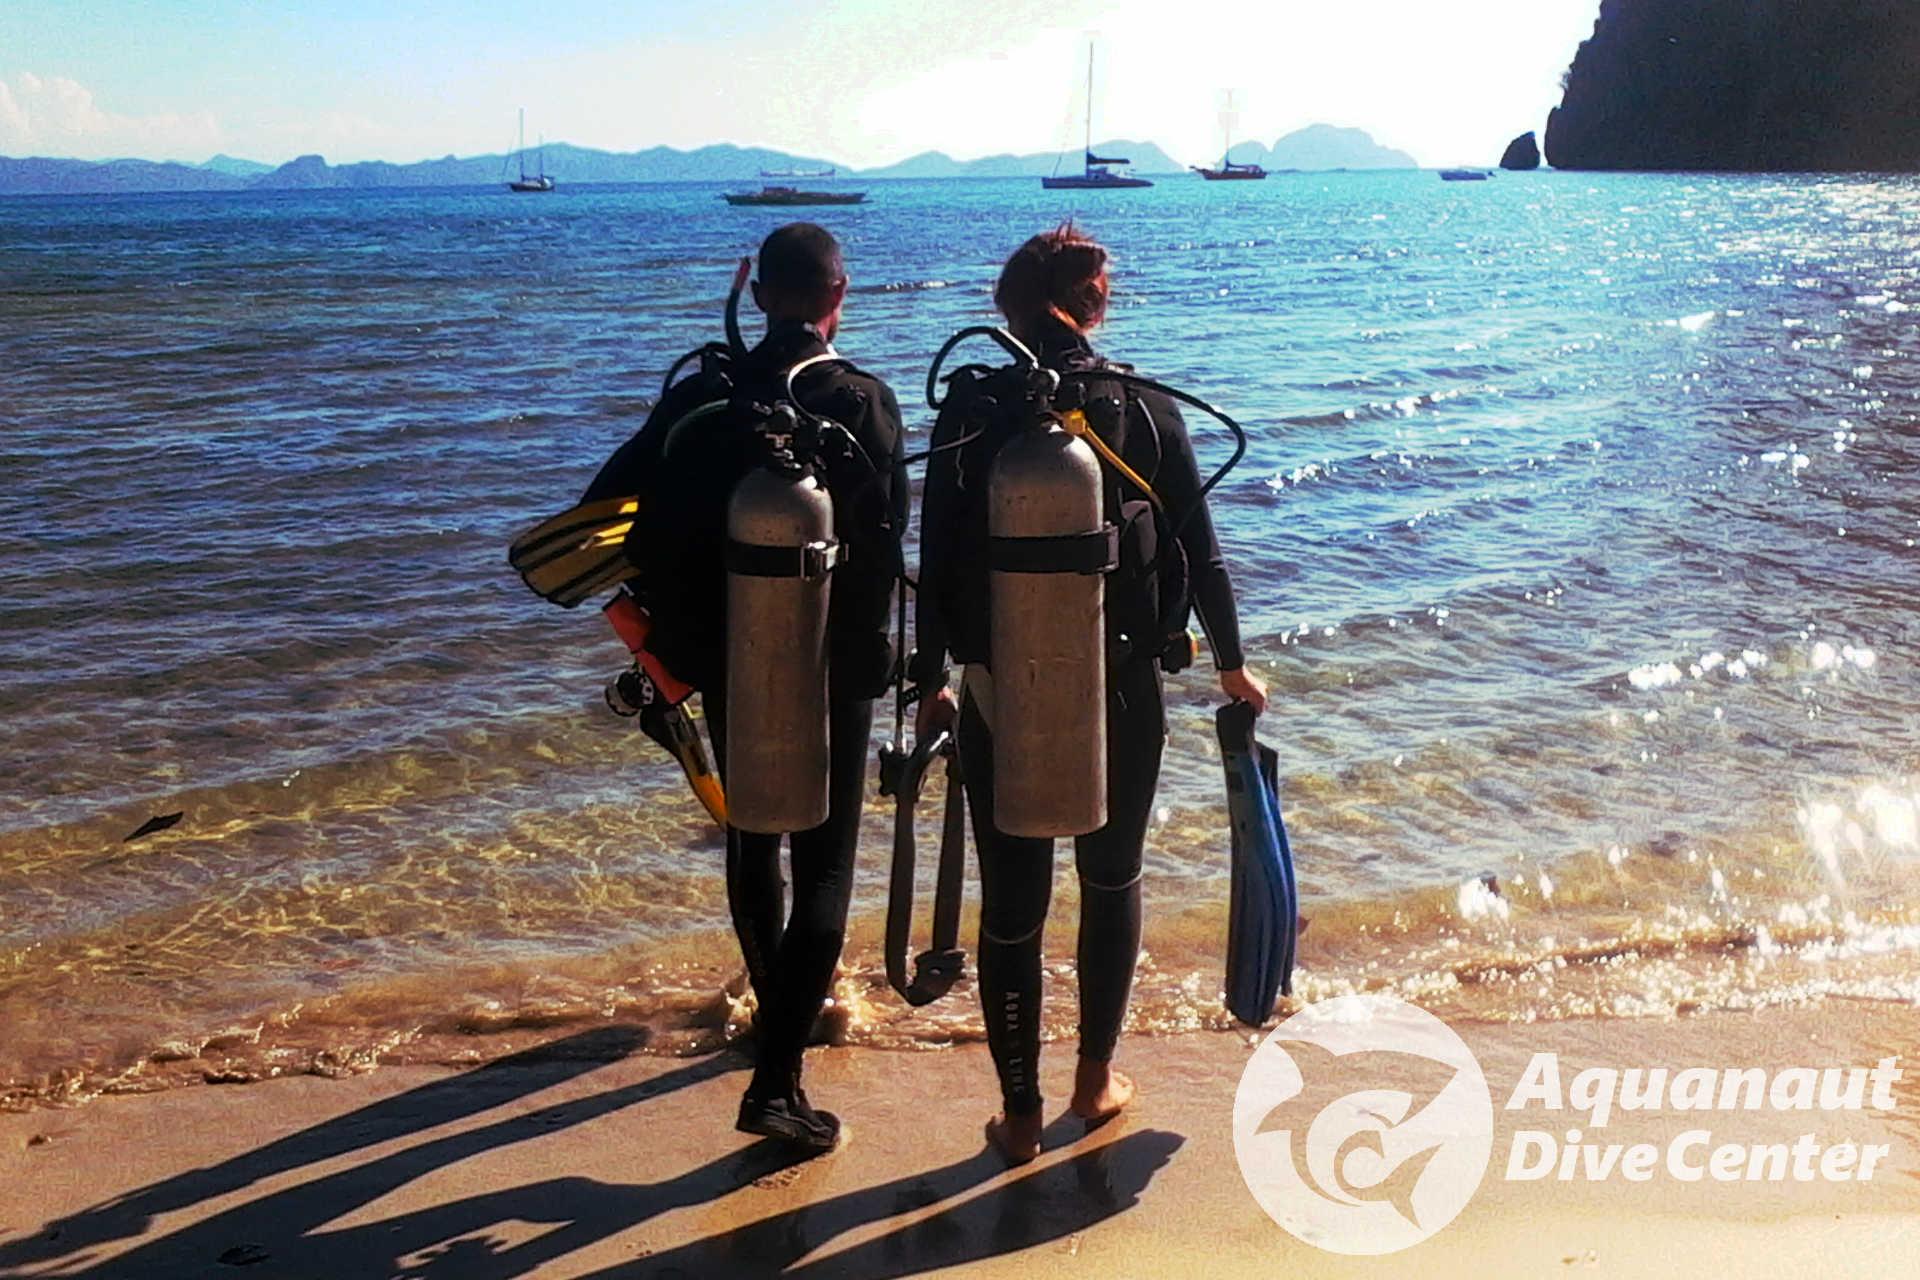 Divemaster Internship - Trainee with instructor